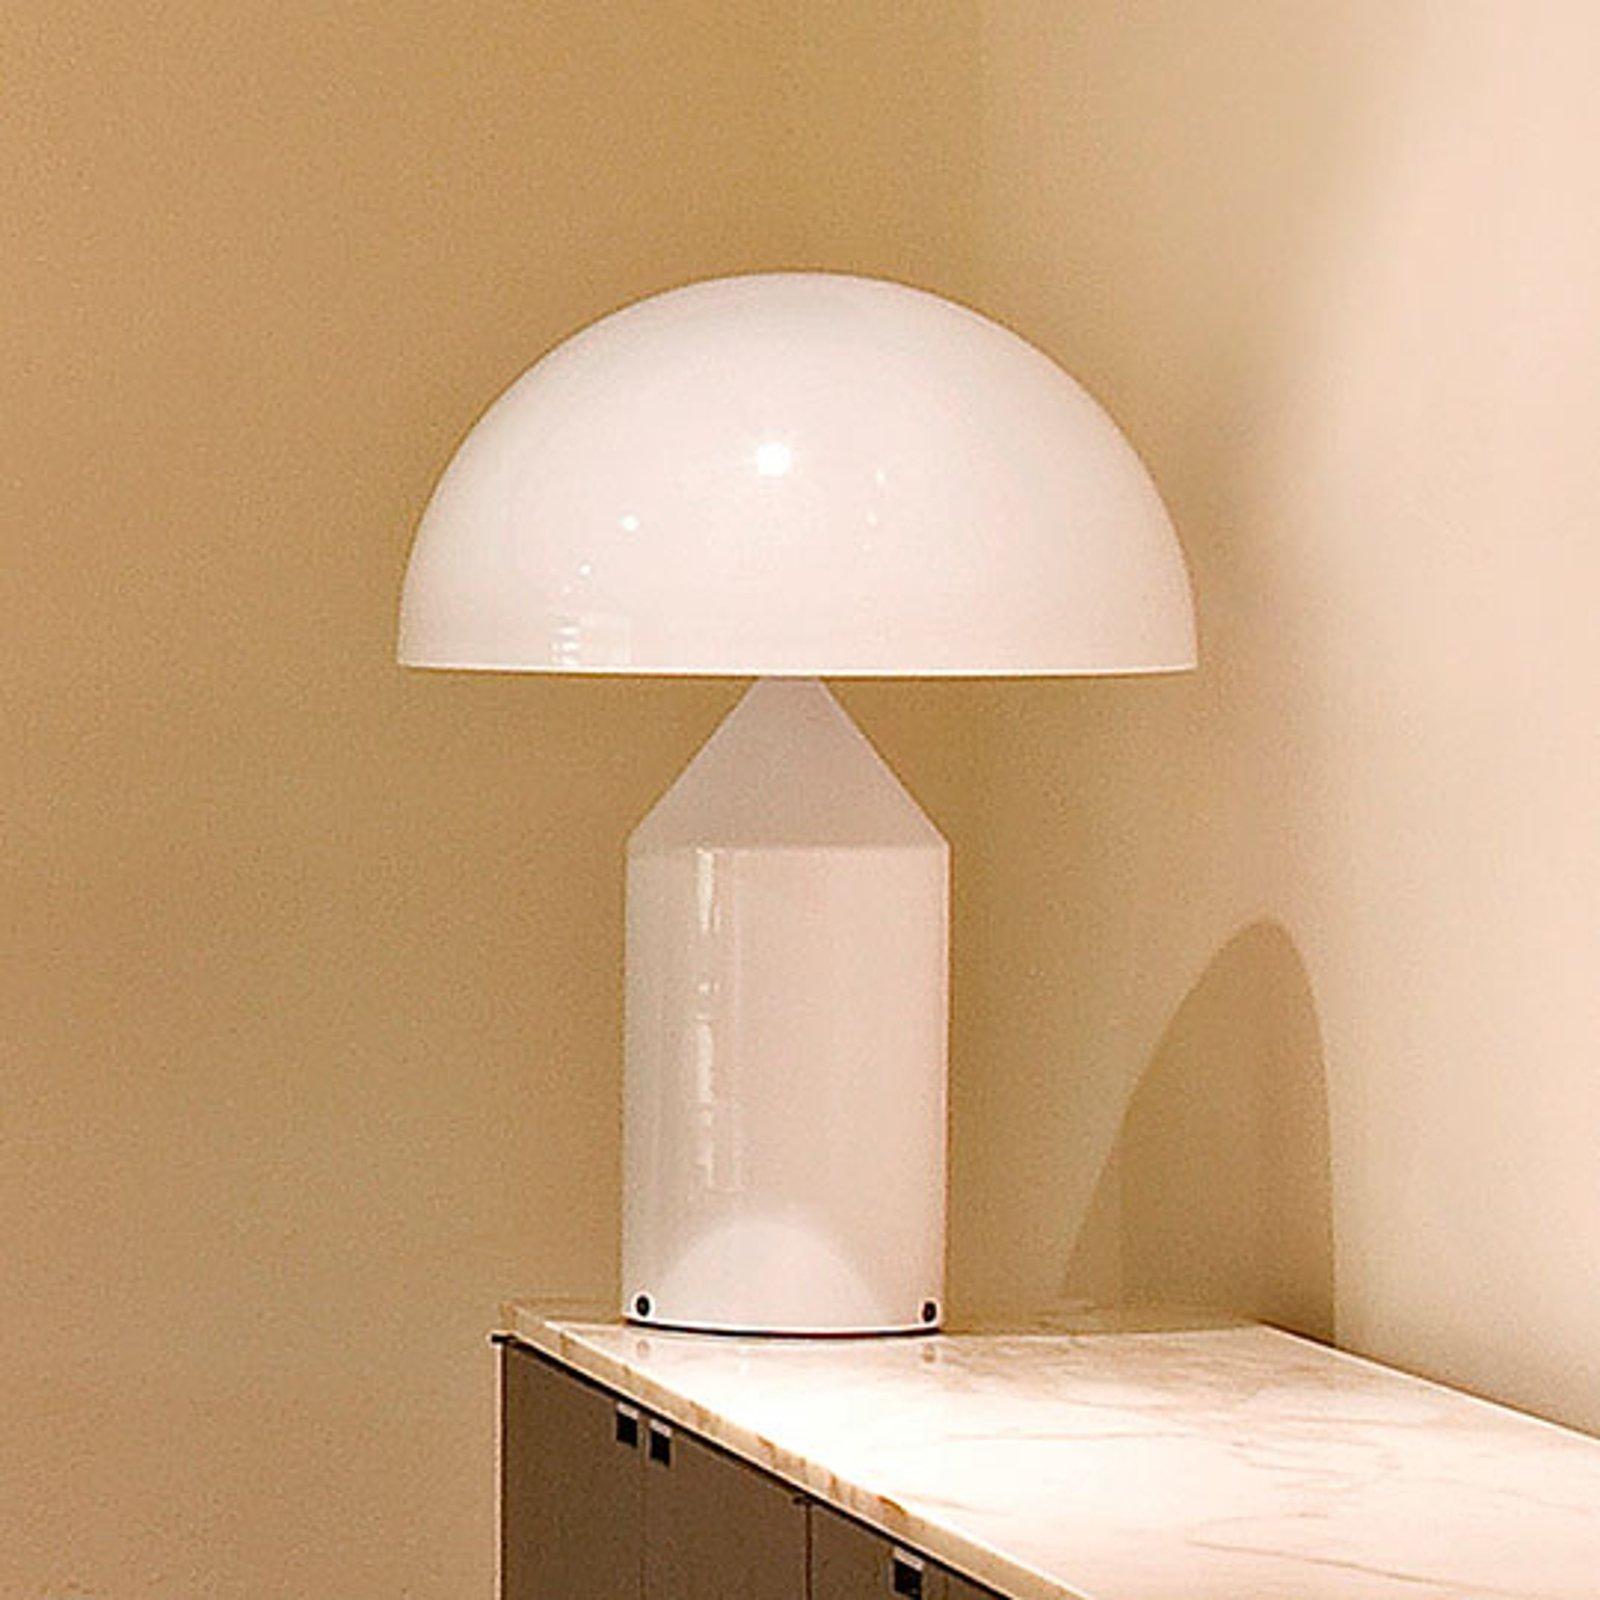 Design-bordlampe Atollo m. dimmer, hvit